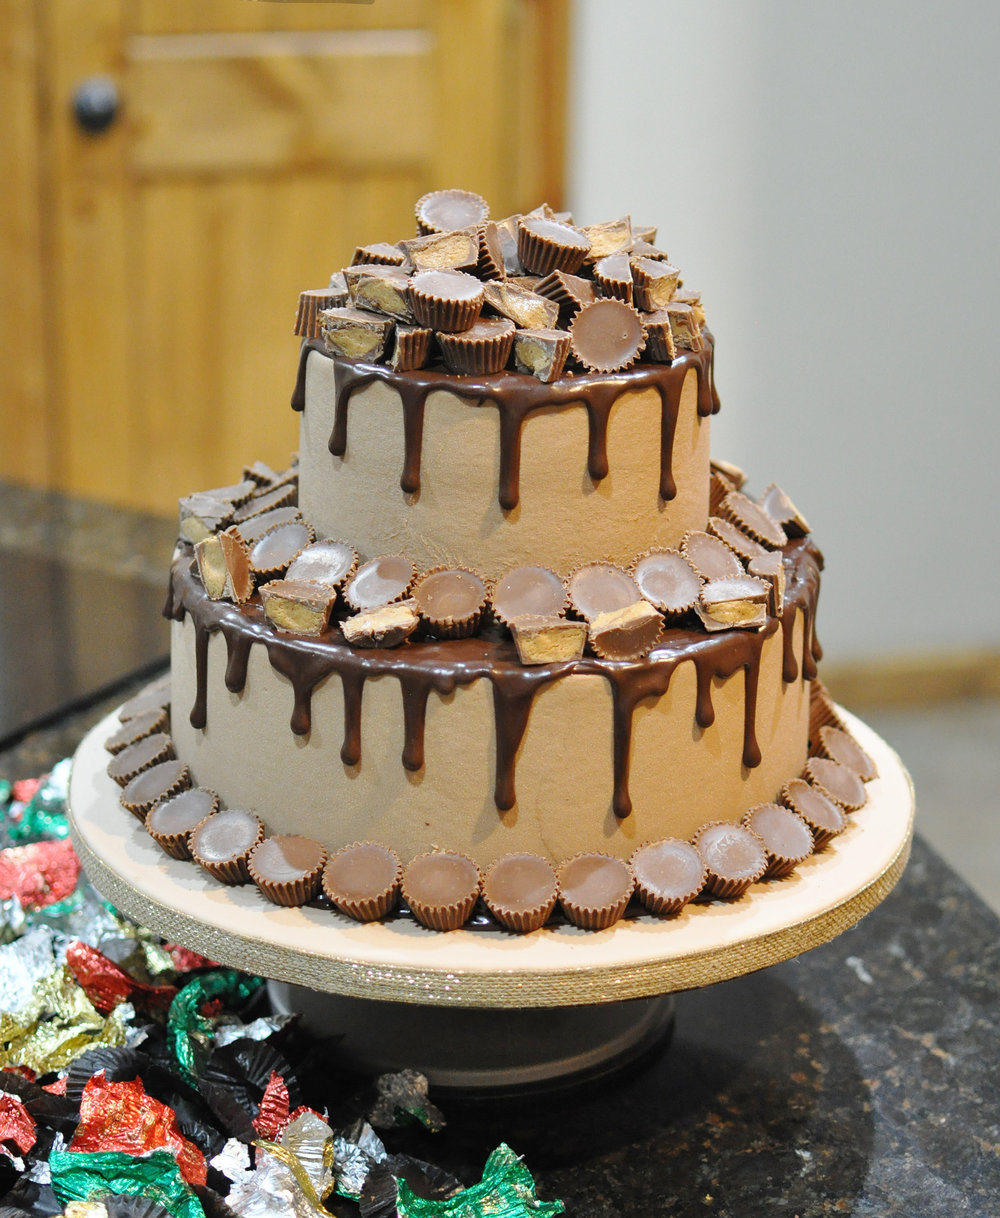 Chocolate Cake 24.jpg